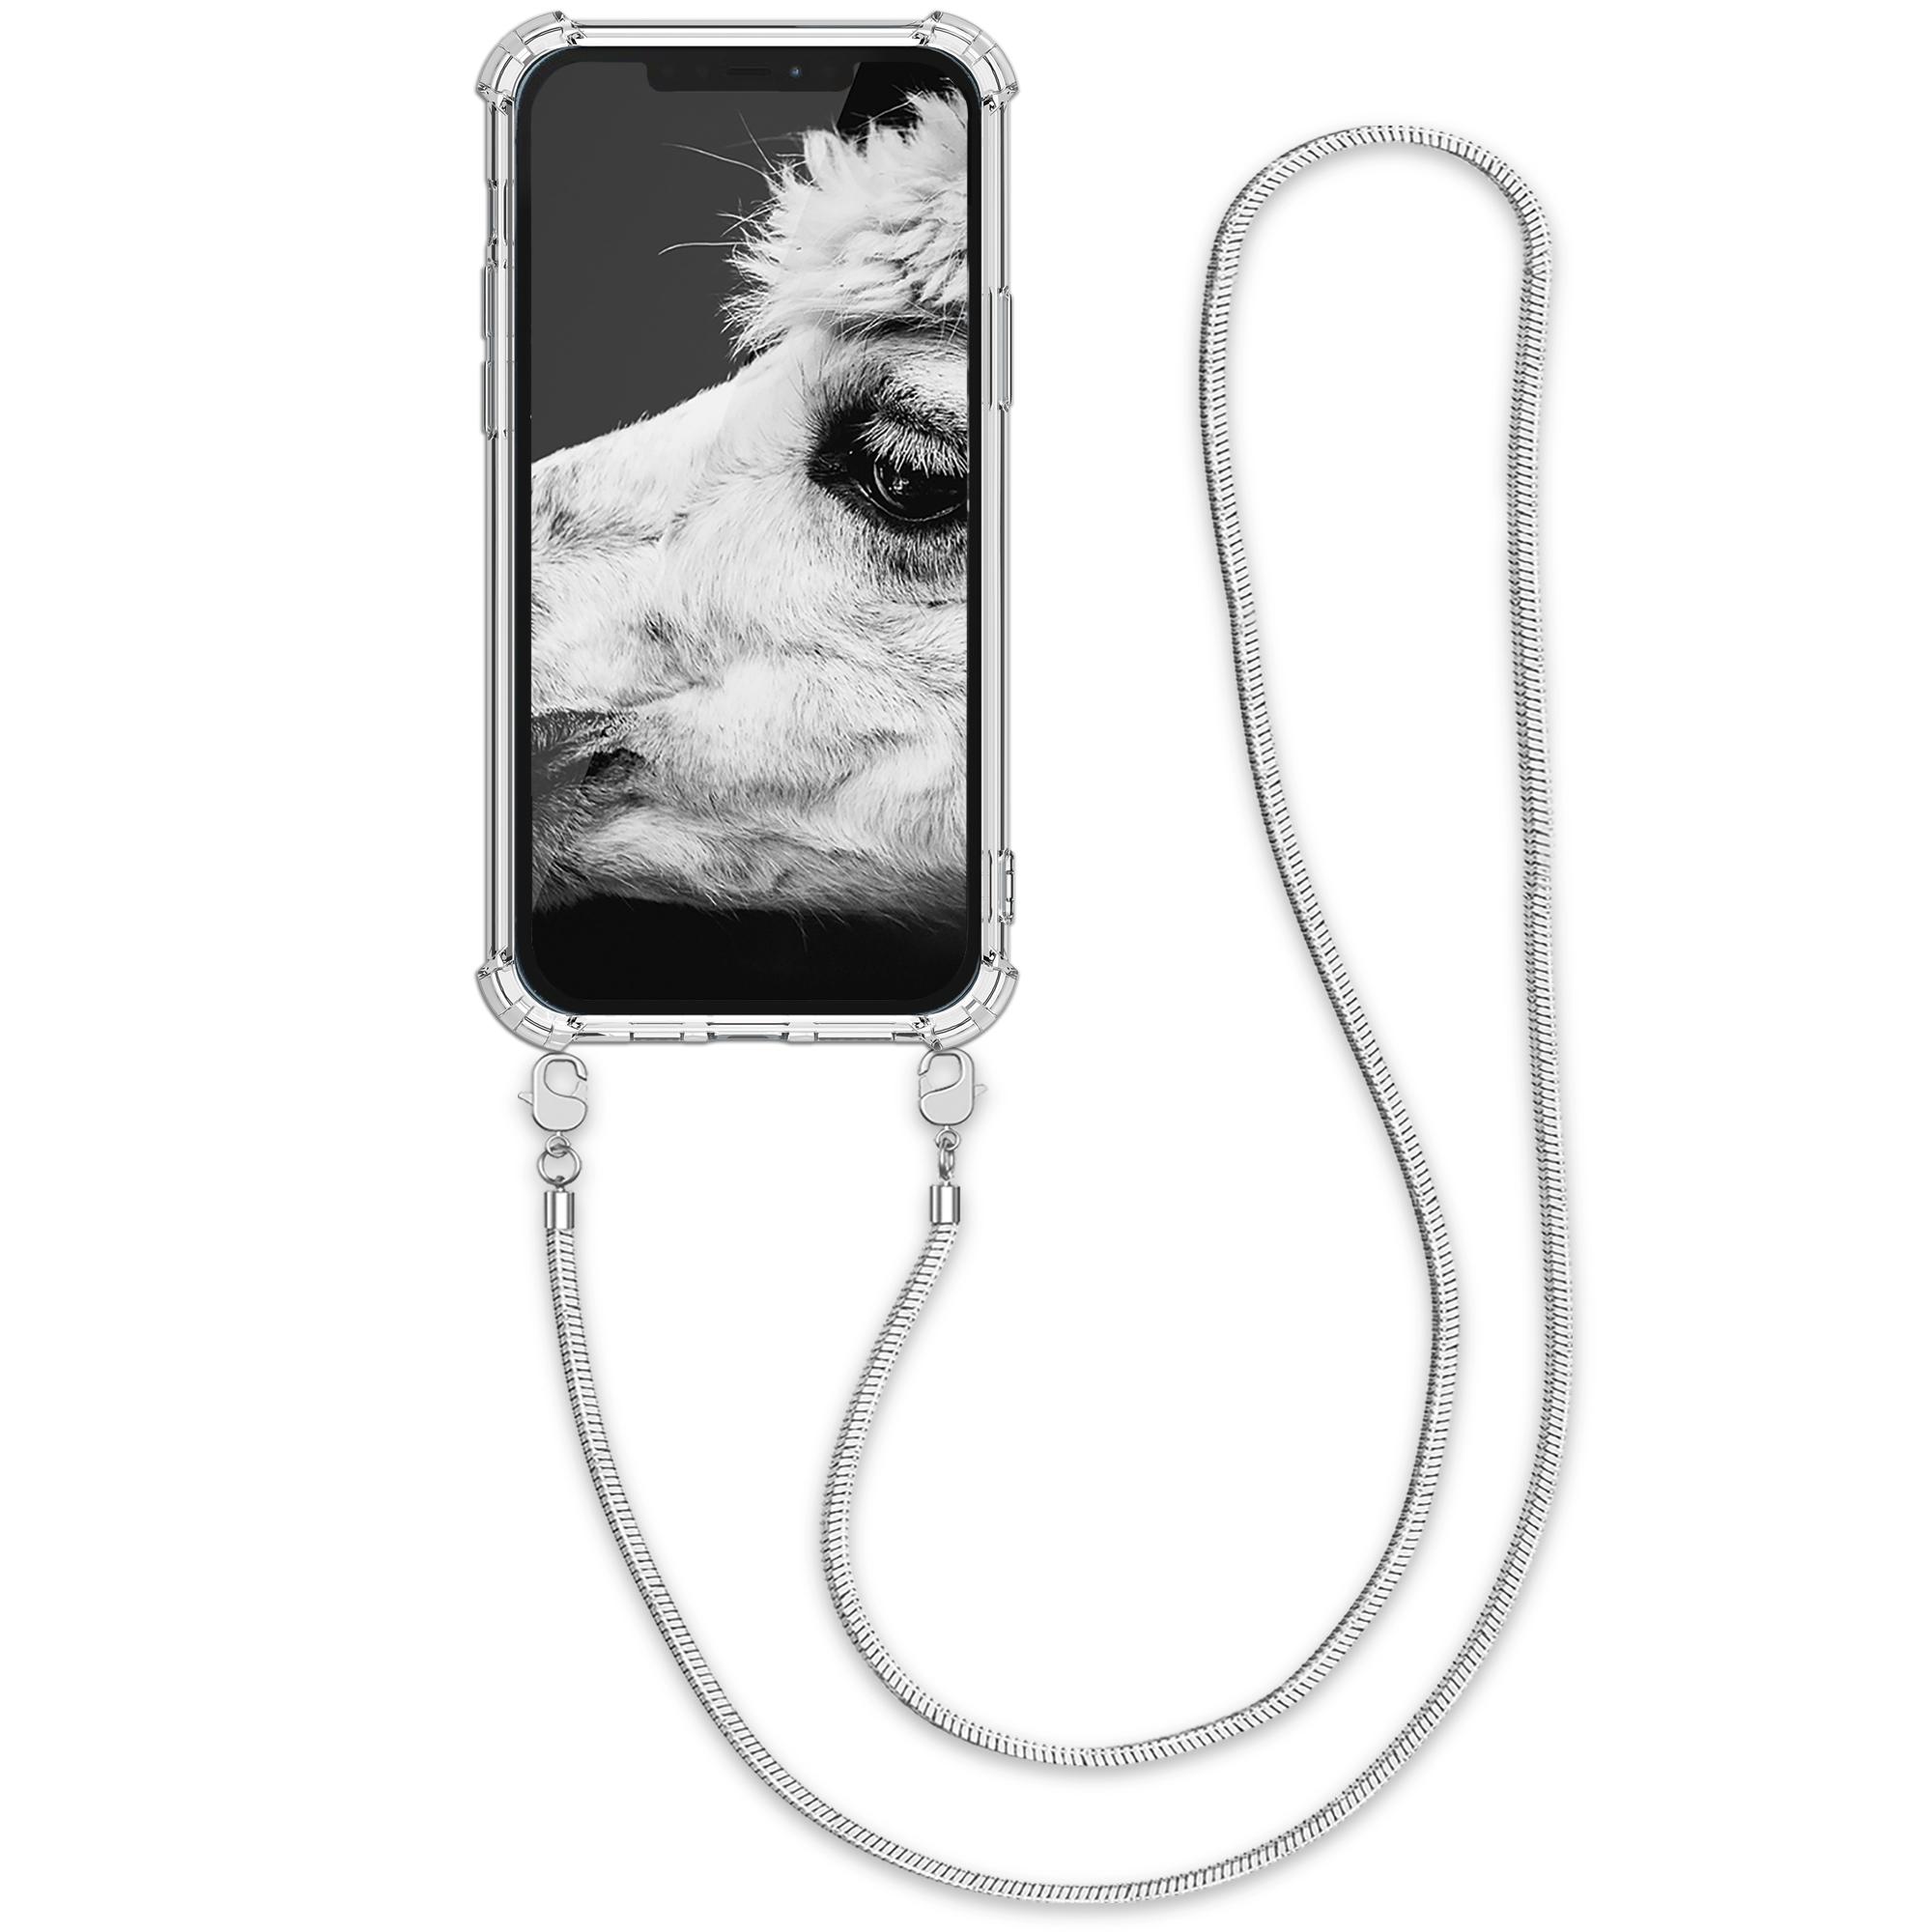 Kvalitní silikonové TPU pouzdro pro Apple iPhone 12 Pro Max - Transparent | Silver